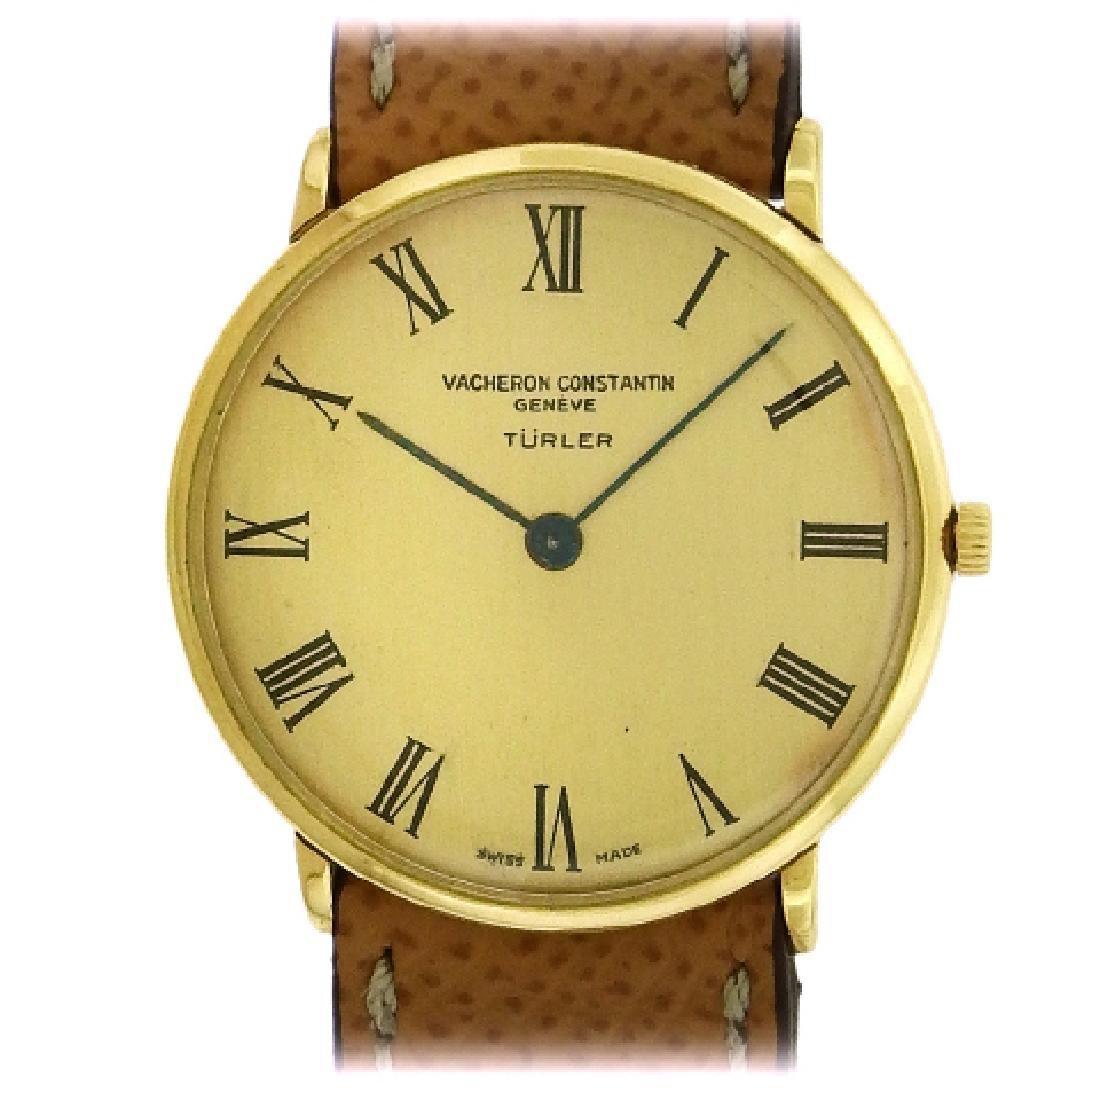 Vacheron & Constantin 18K Yellow Gold Watch, 1960